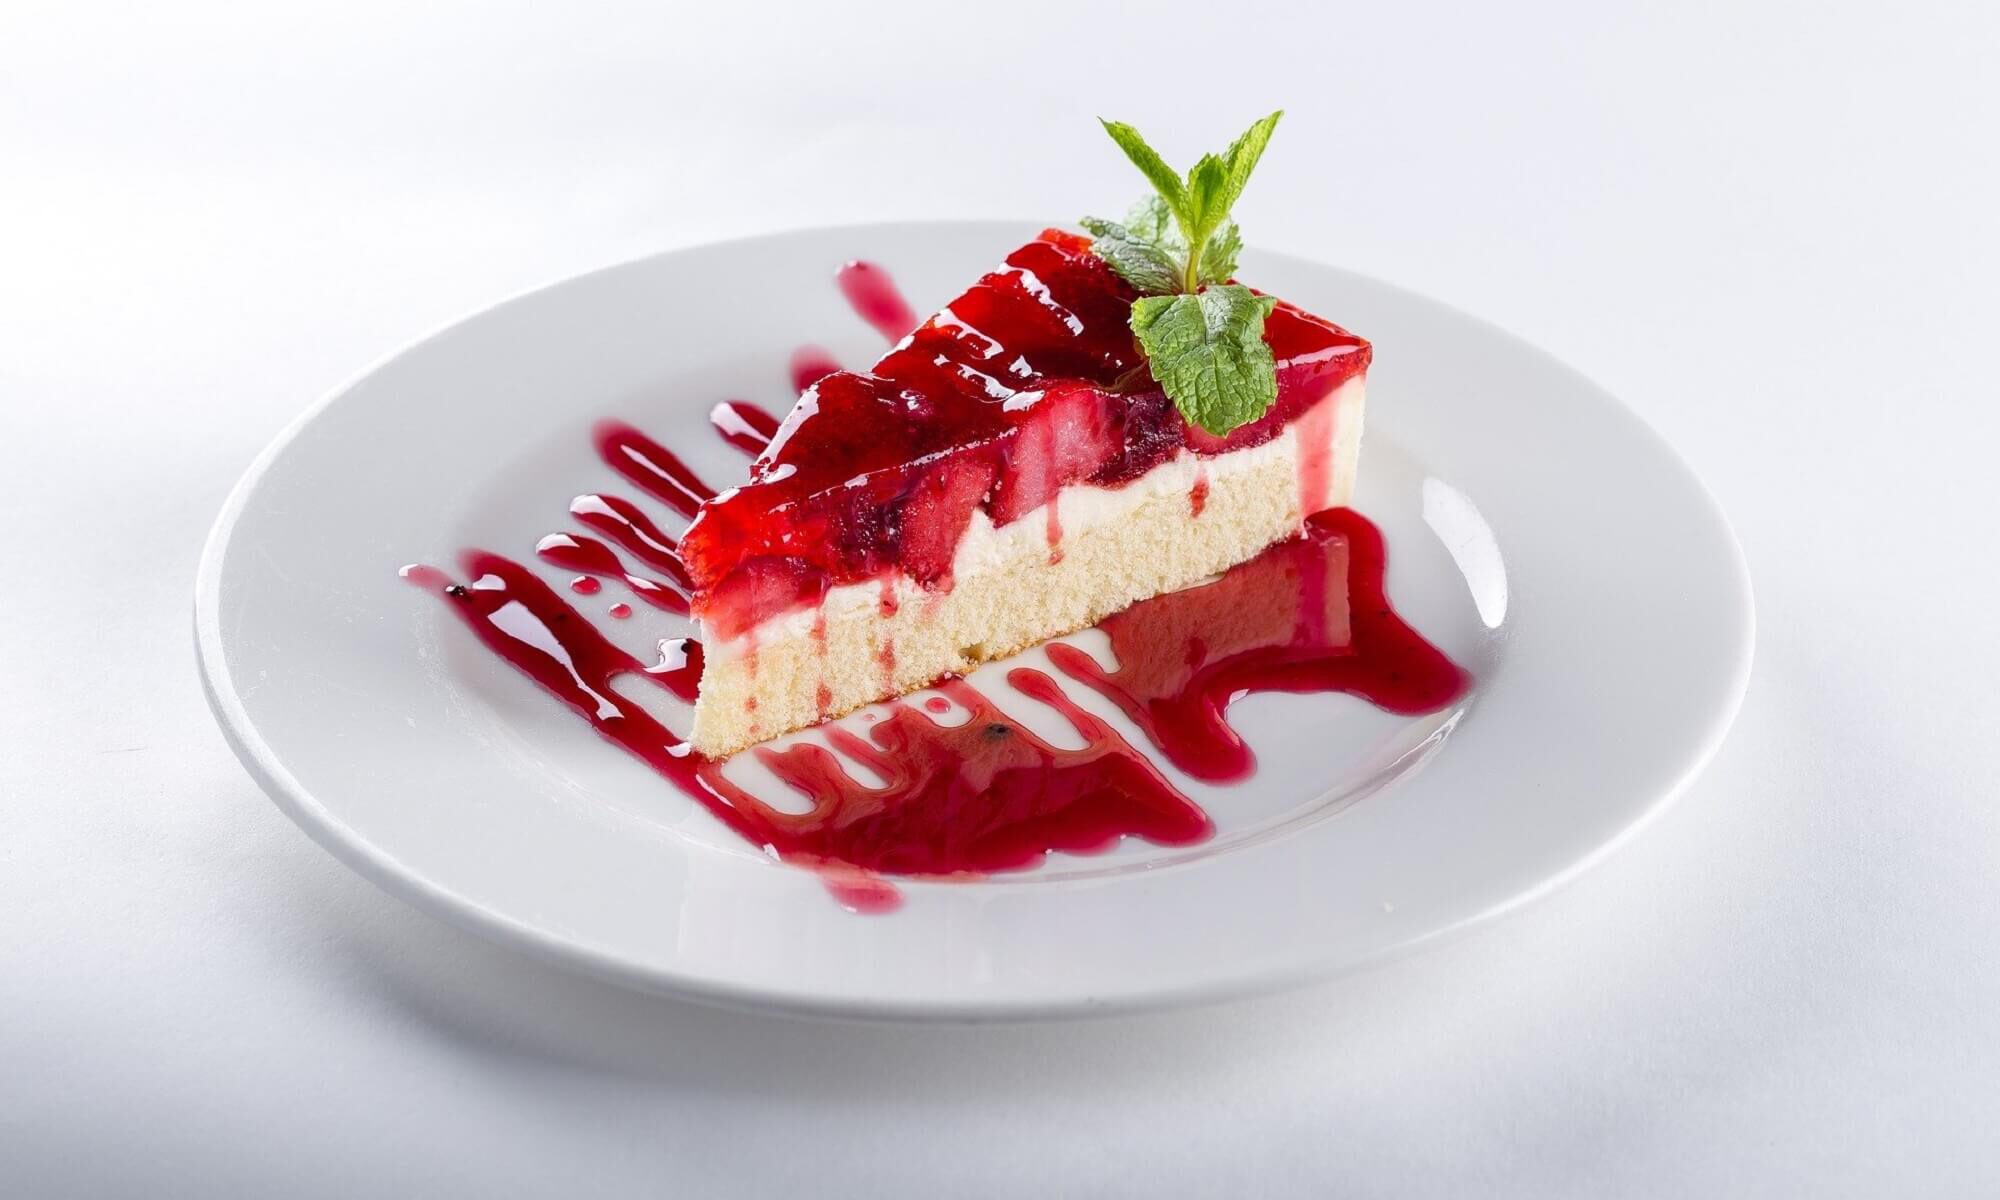 Ewa gotuje blog kulinarny